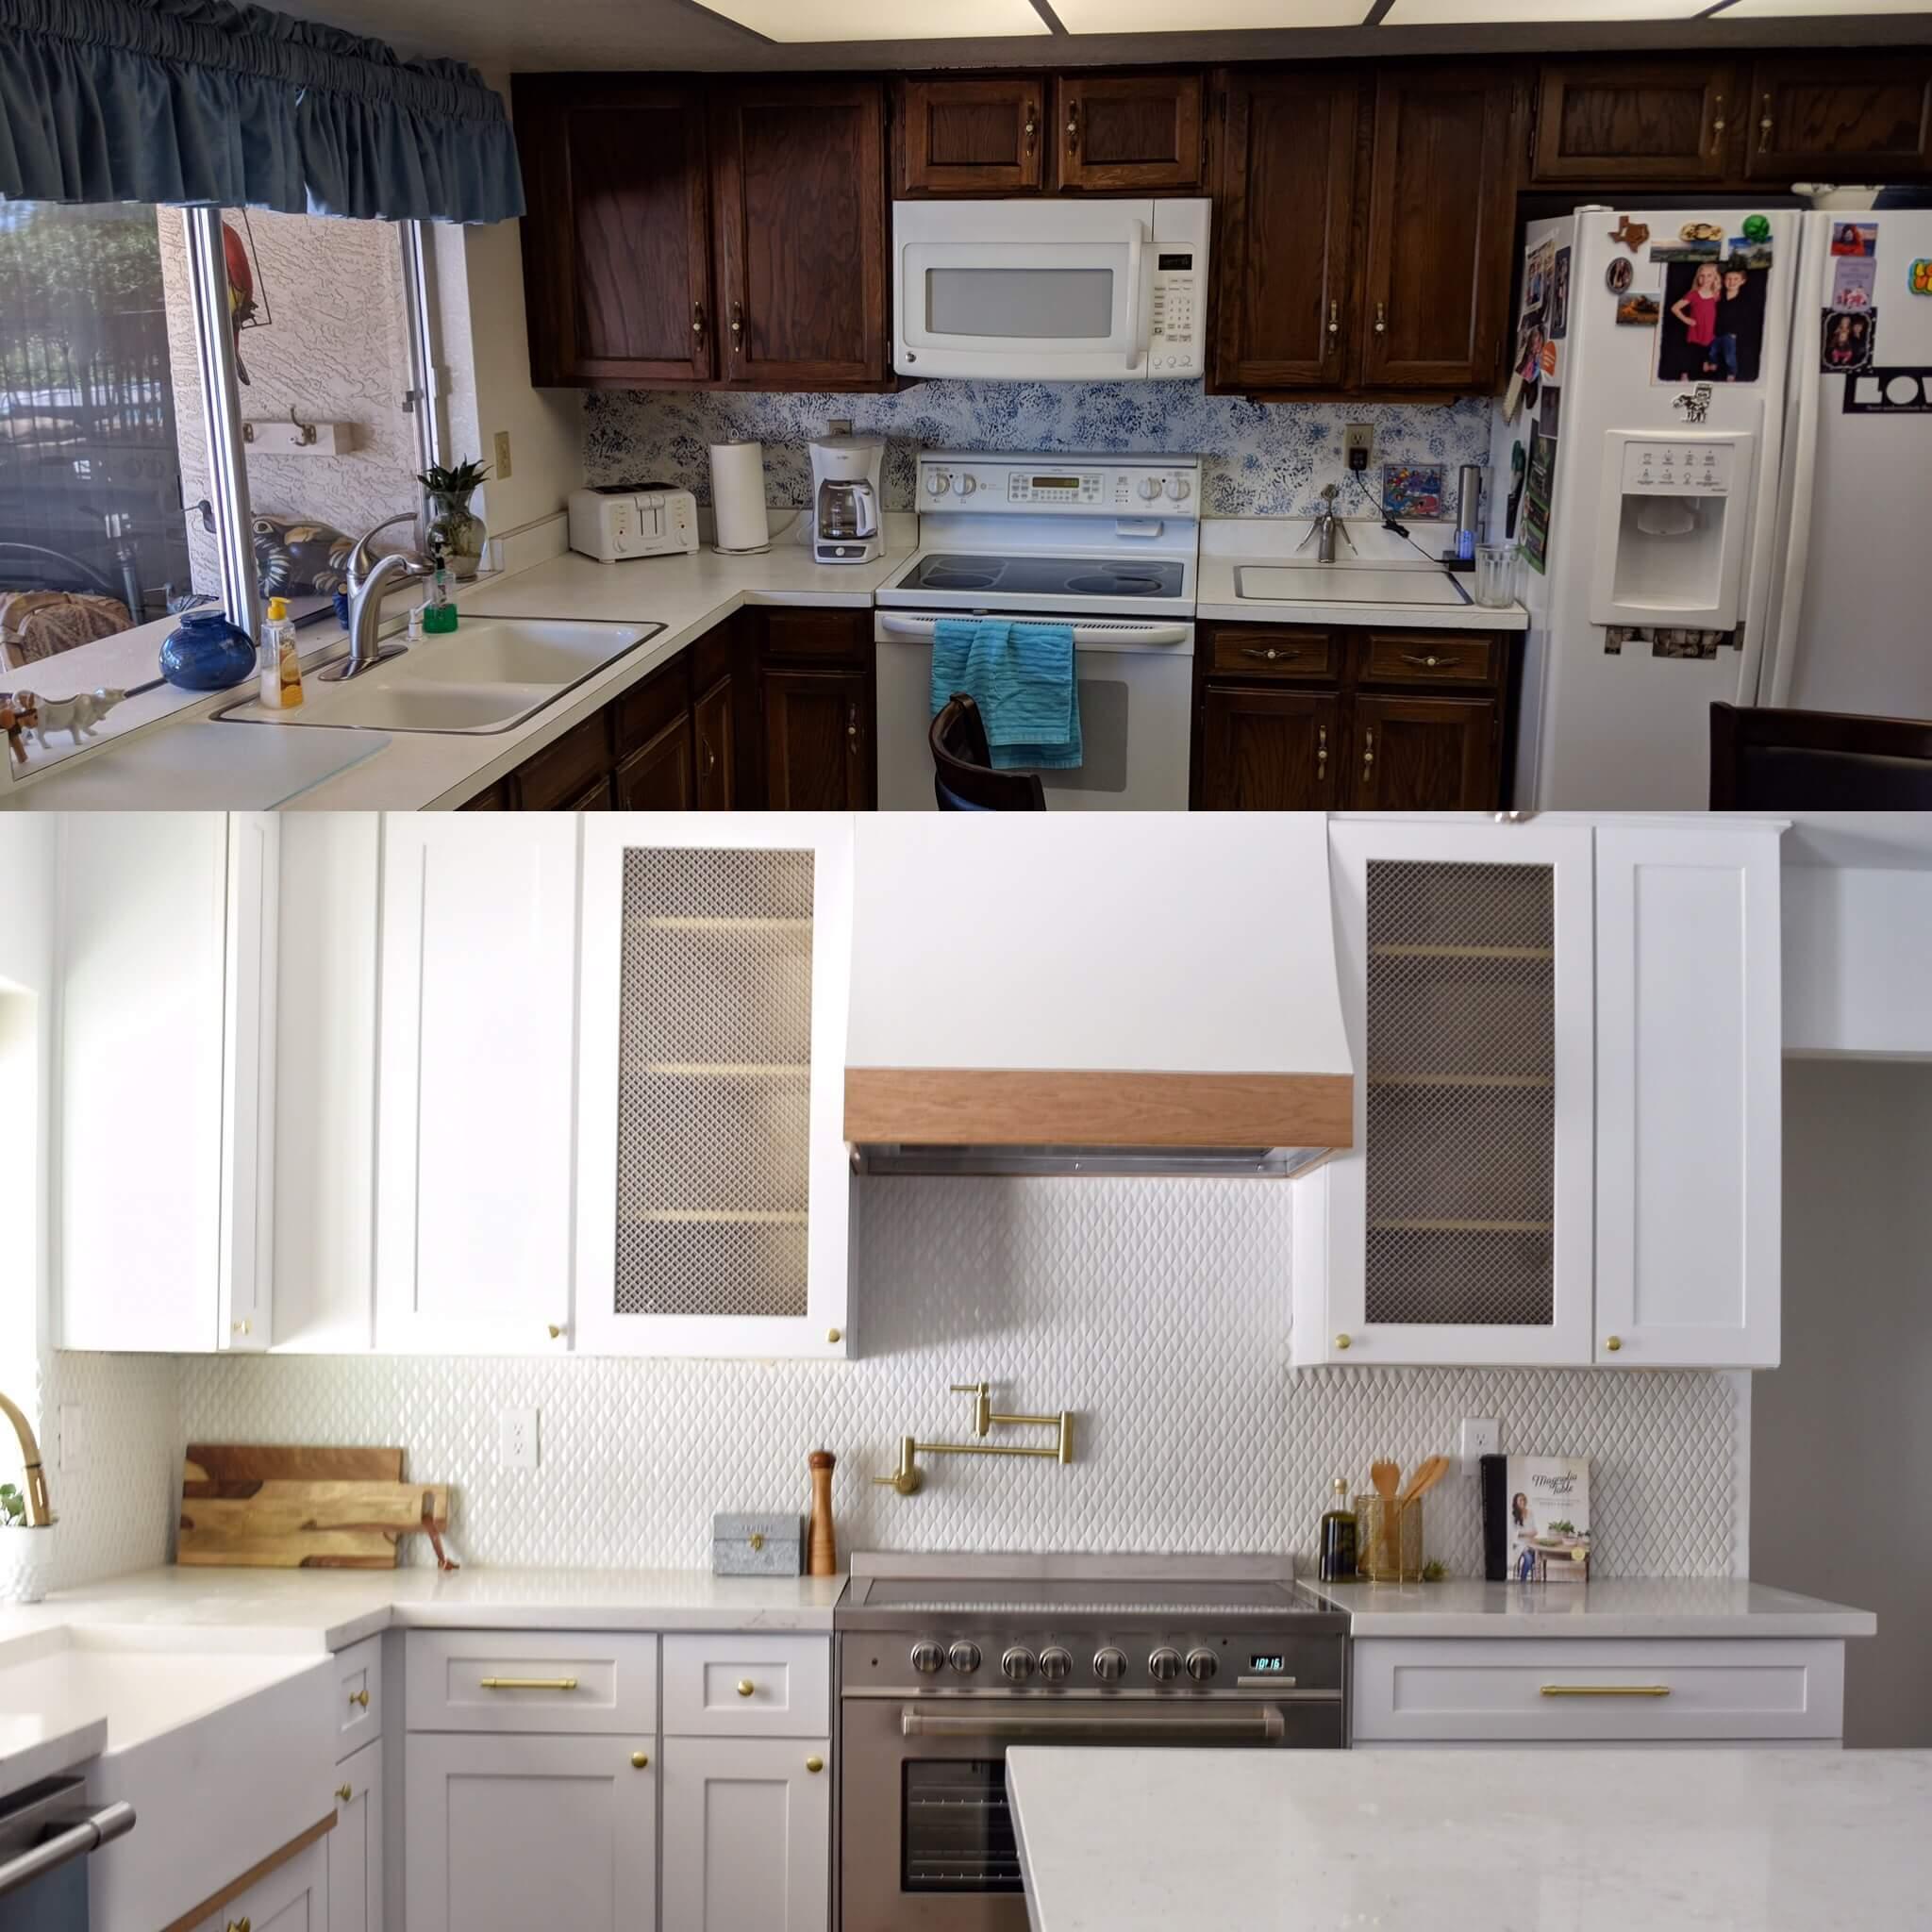 Sonoran Desert Living - Charter Oak Before and After .jpg